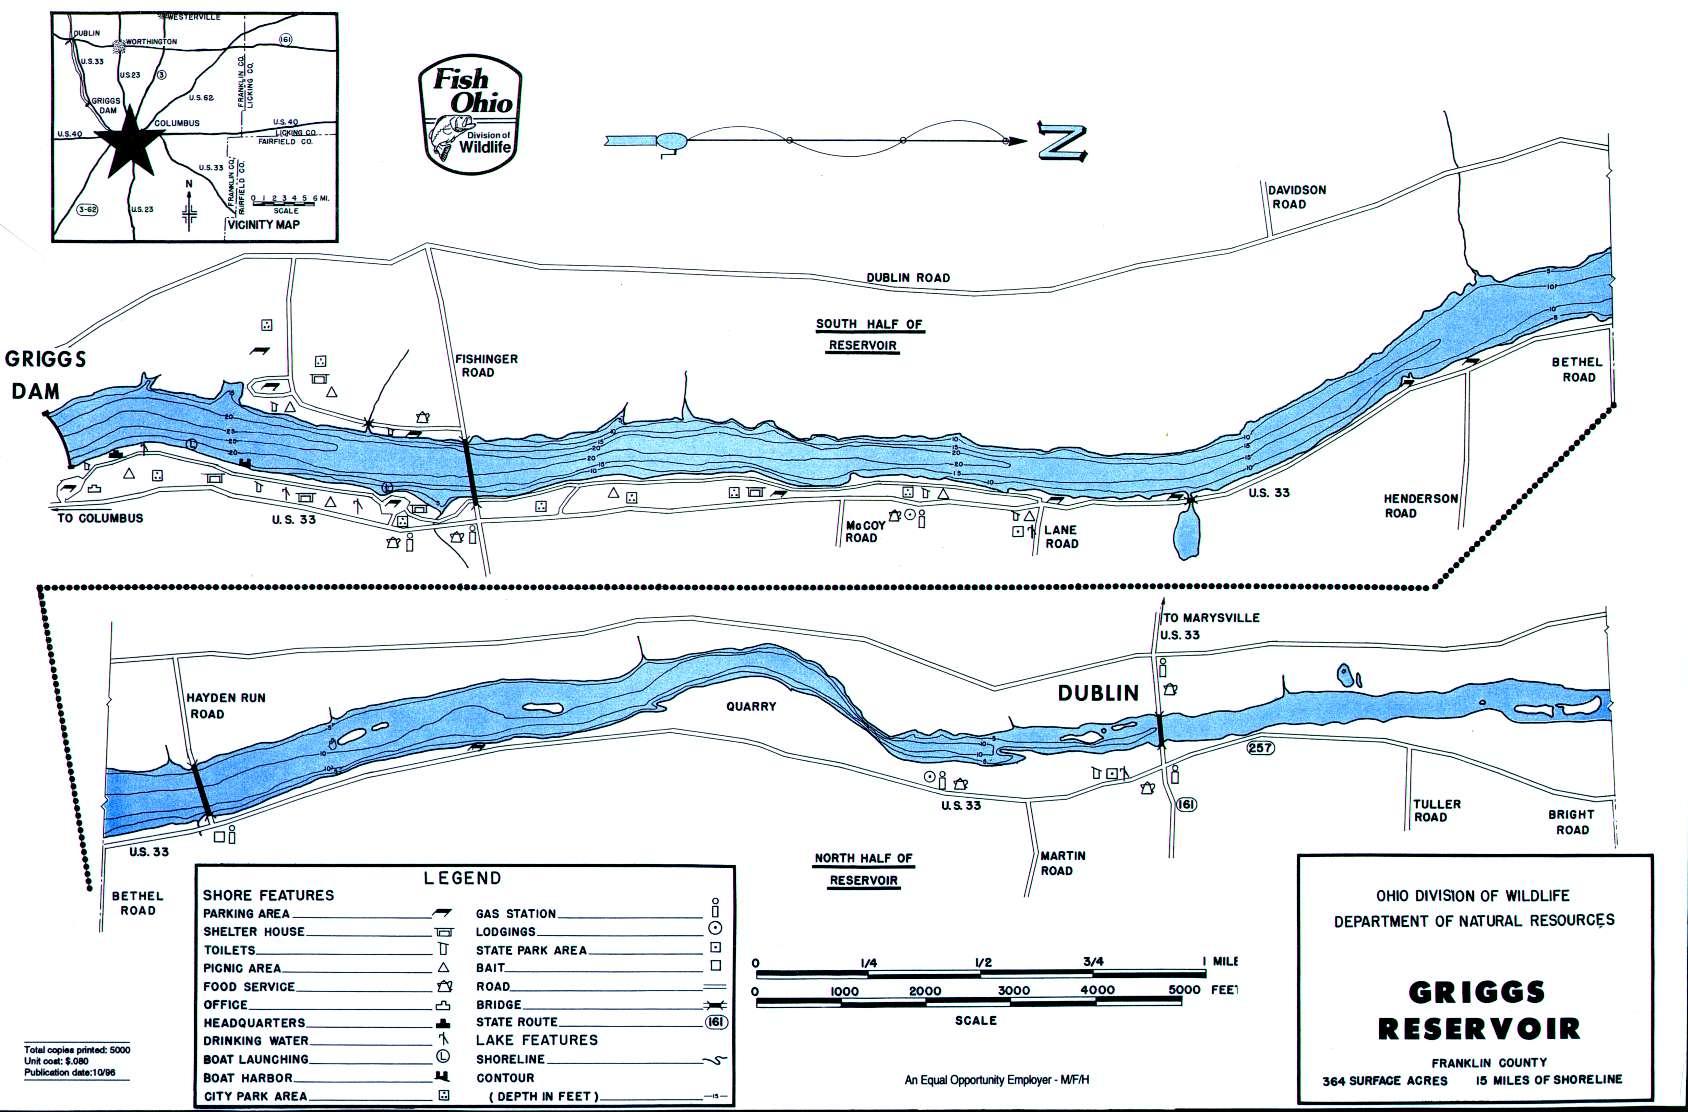 Griggs Reservoir Fishing Map - GoFishOhio!